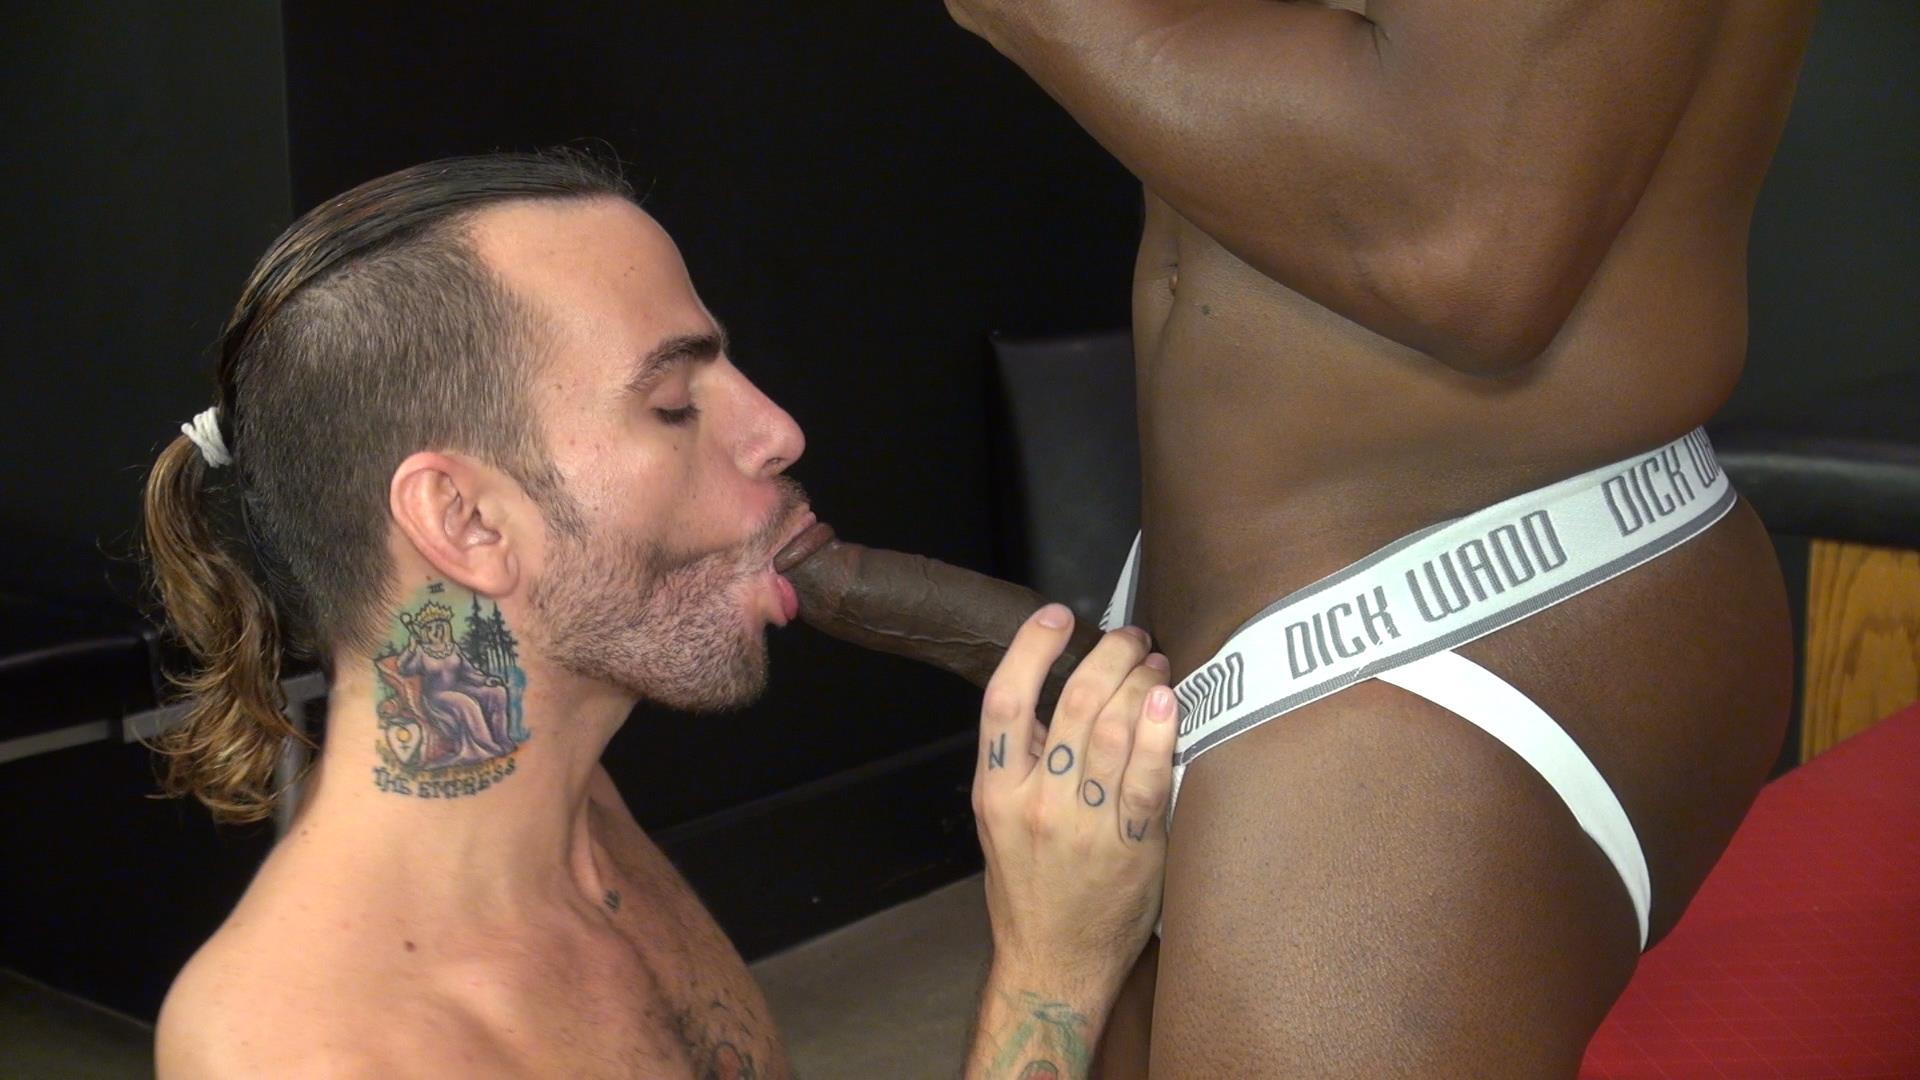 Raw-and-Rough-Champ-Robinson-Lukas-Cipriani-Knockout-Tigger-Redd-BBBH-Amateur-Gay-Porn-20 White Boy Gets A Breeding By Three Big Black Dicks